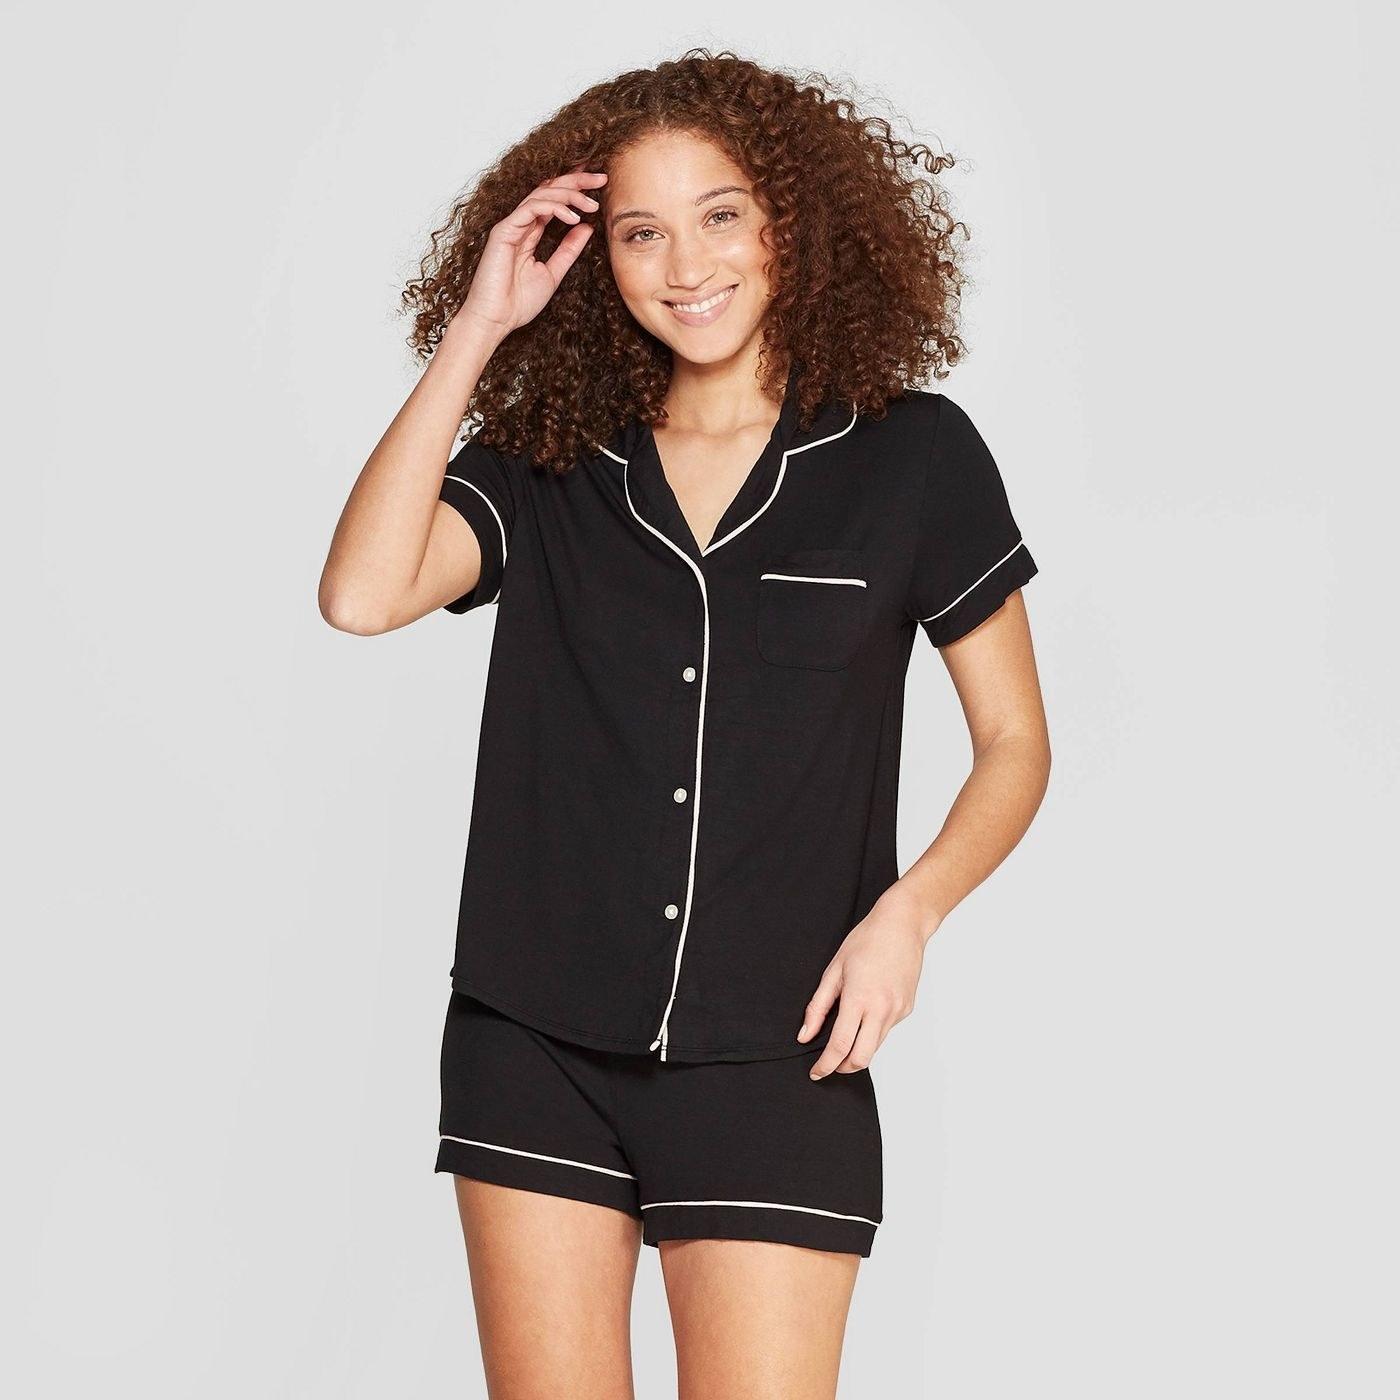 A model wearing a black button shirt and shorts pajama set